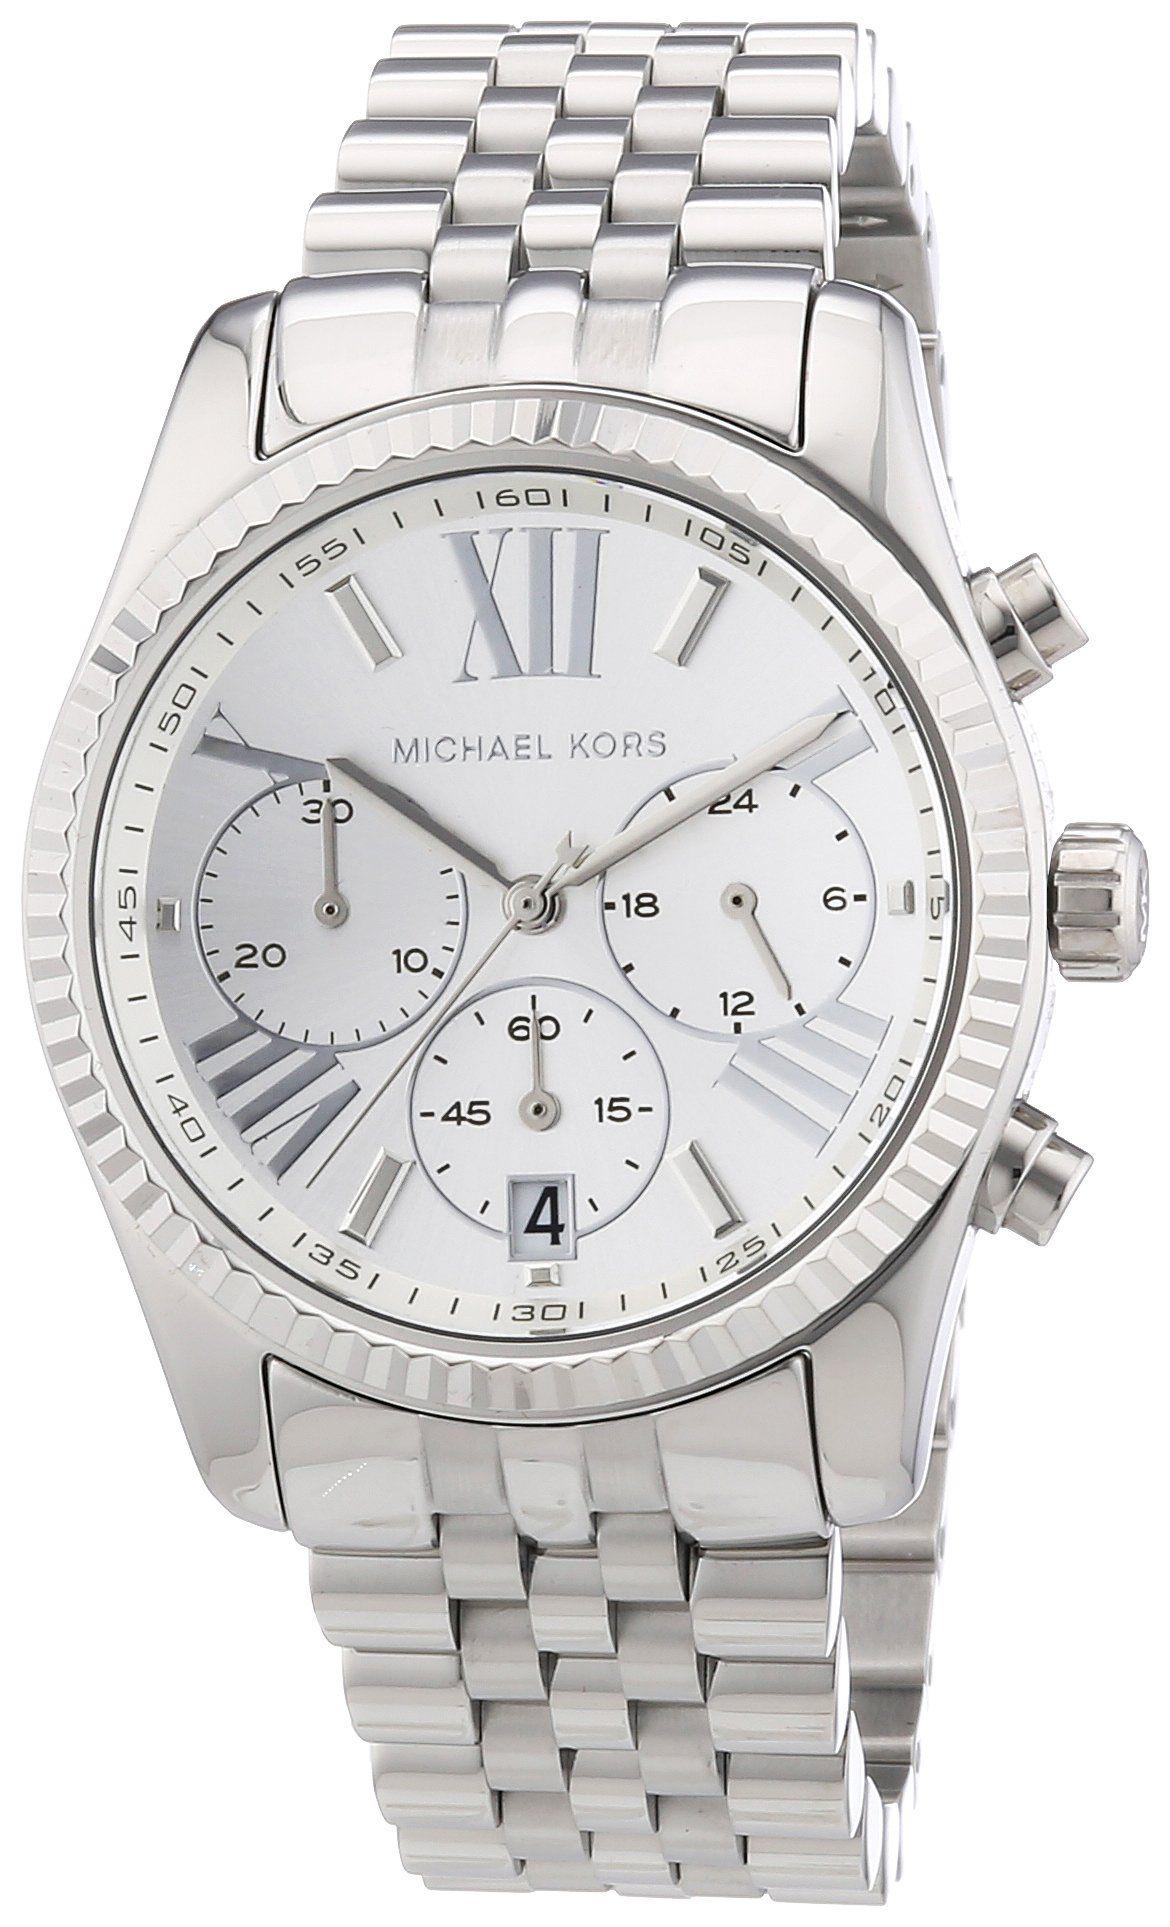 2531ed5f0711e Michael Kors Women s Quartz Watch Lexington Chronograph MK5555 with Metal  Strap  Michael Kors  Amazon.co.uk  Watches